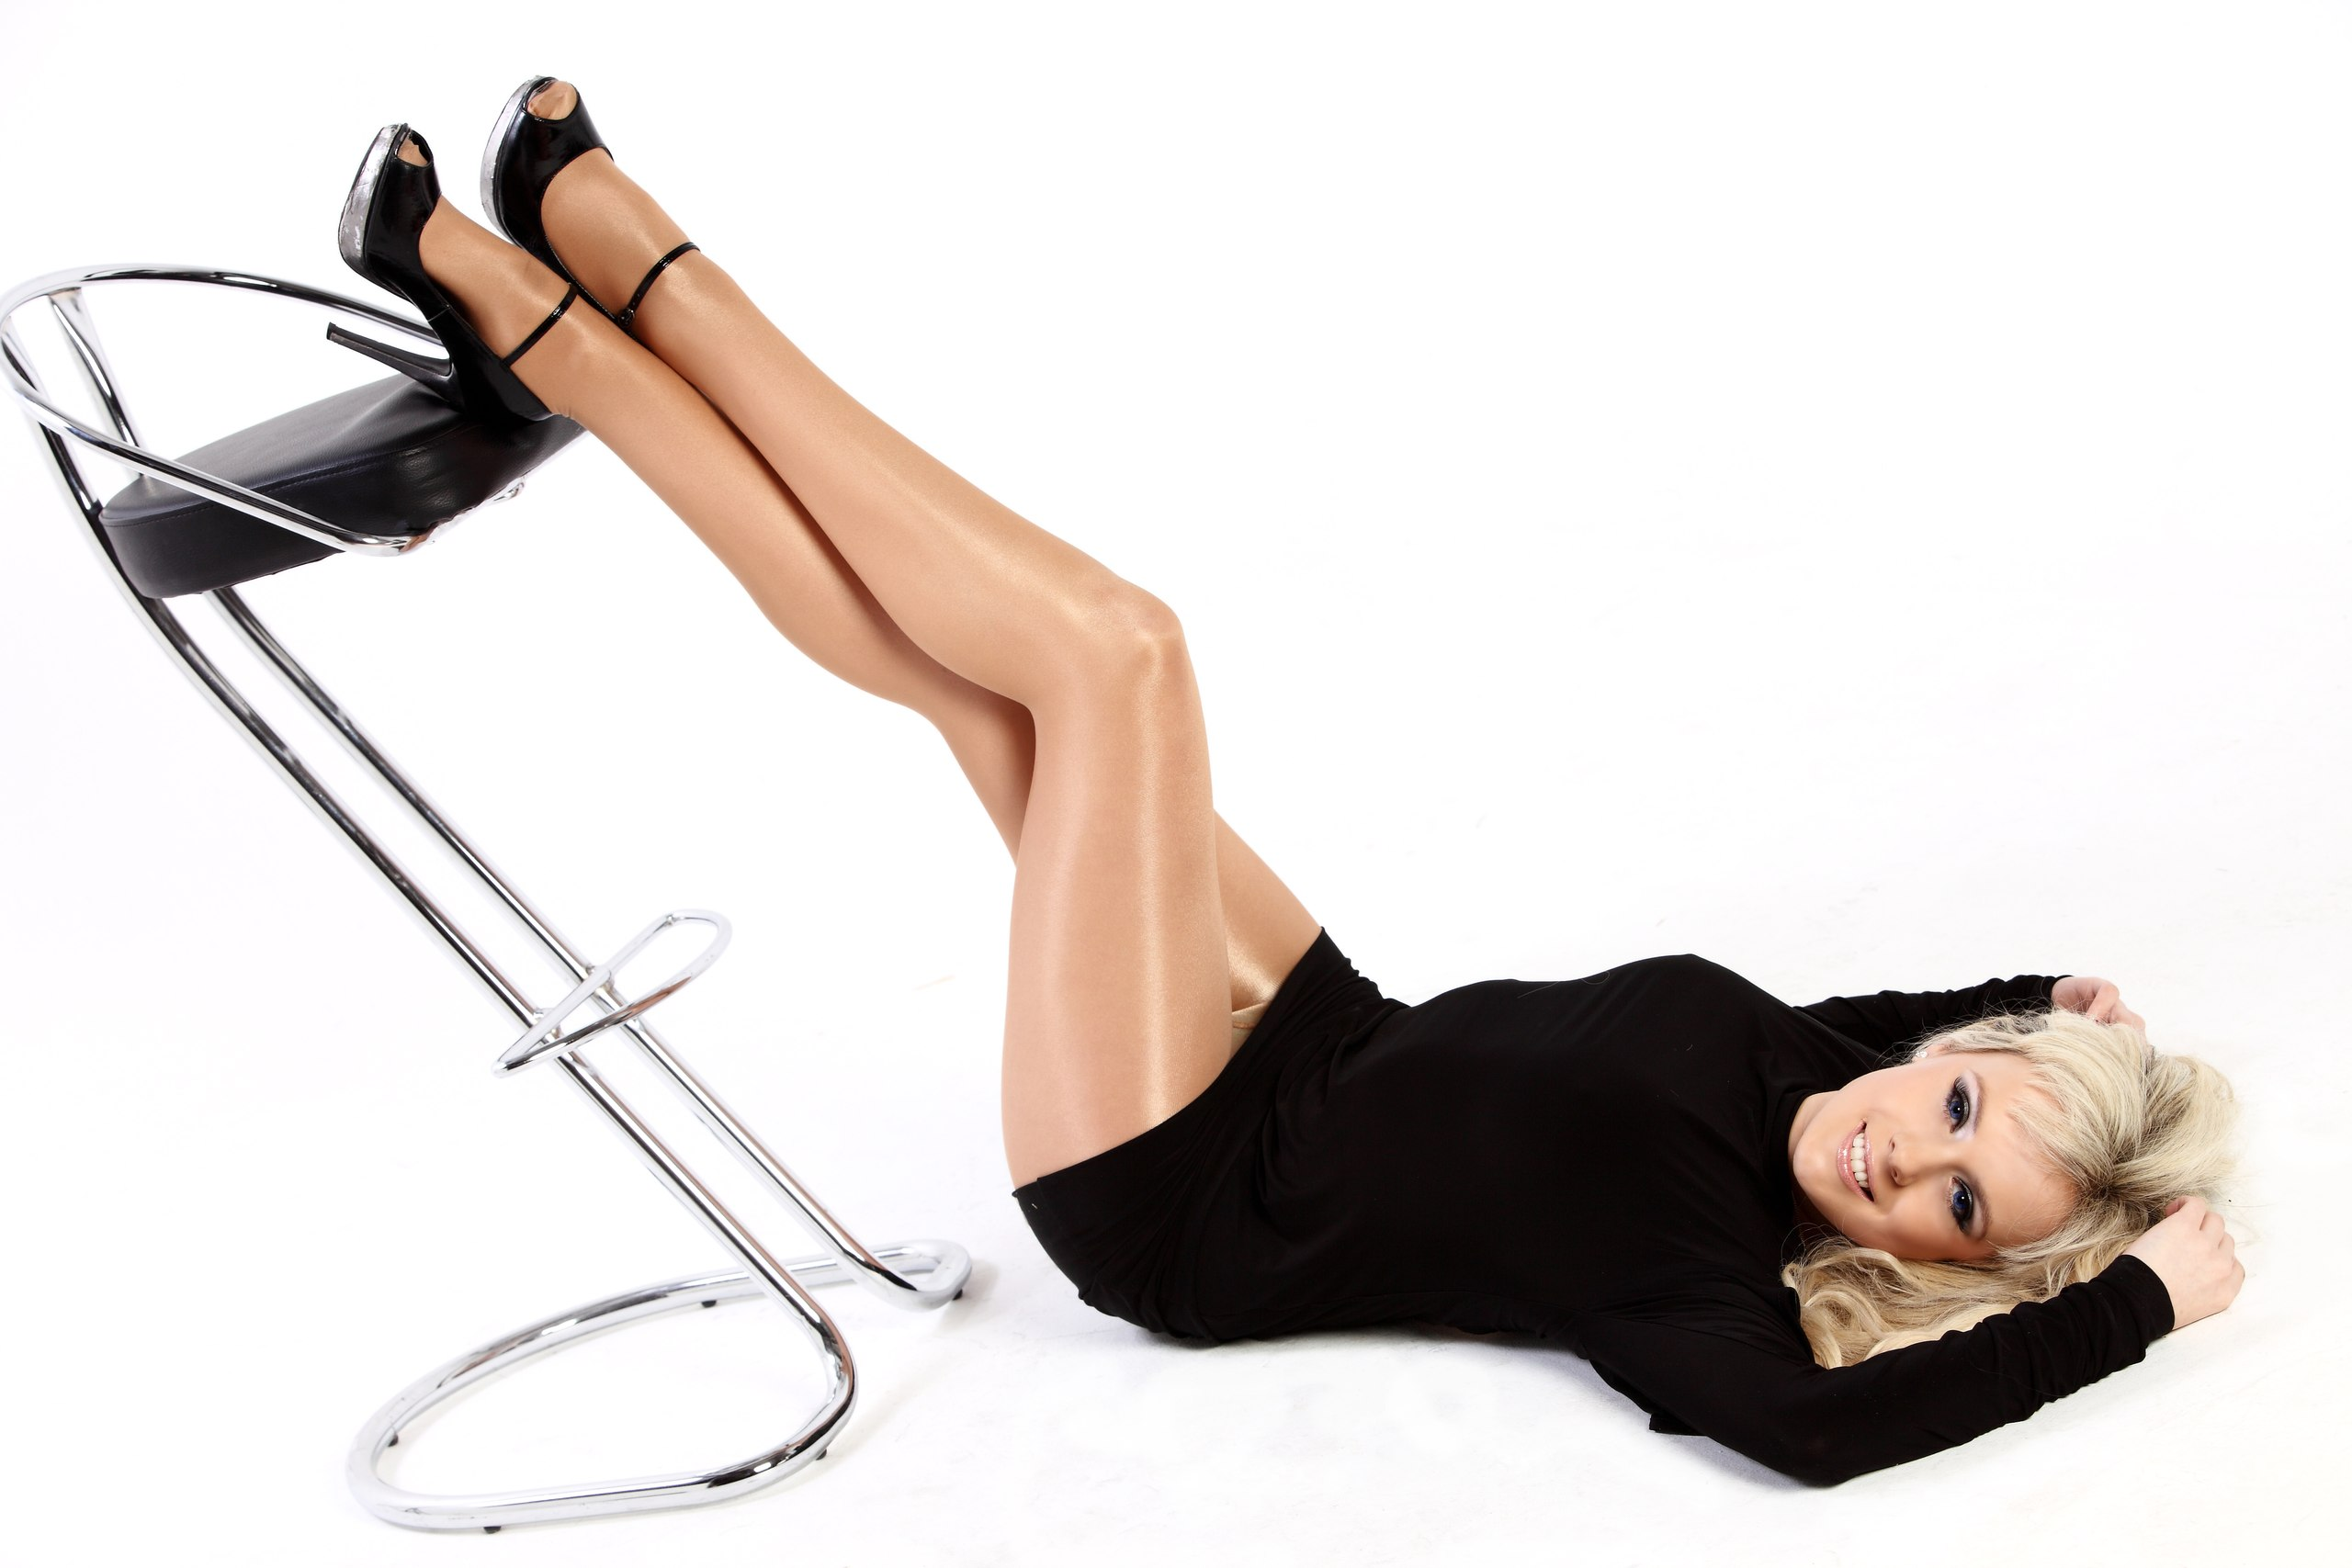 Quel pantyhose model pictures